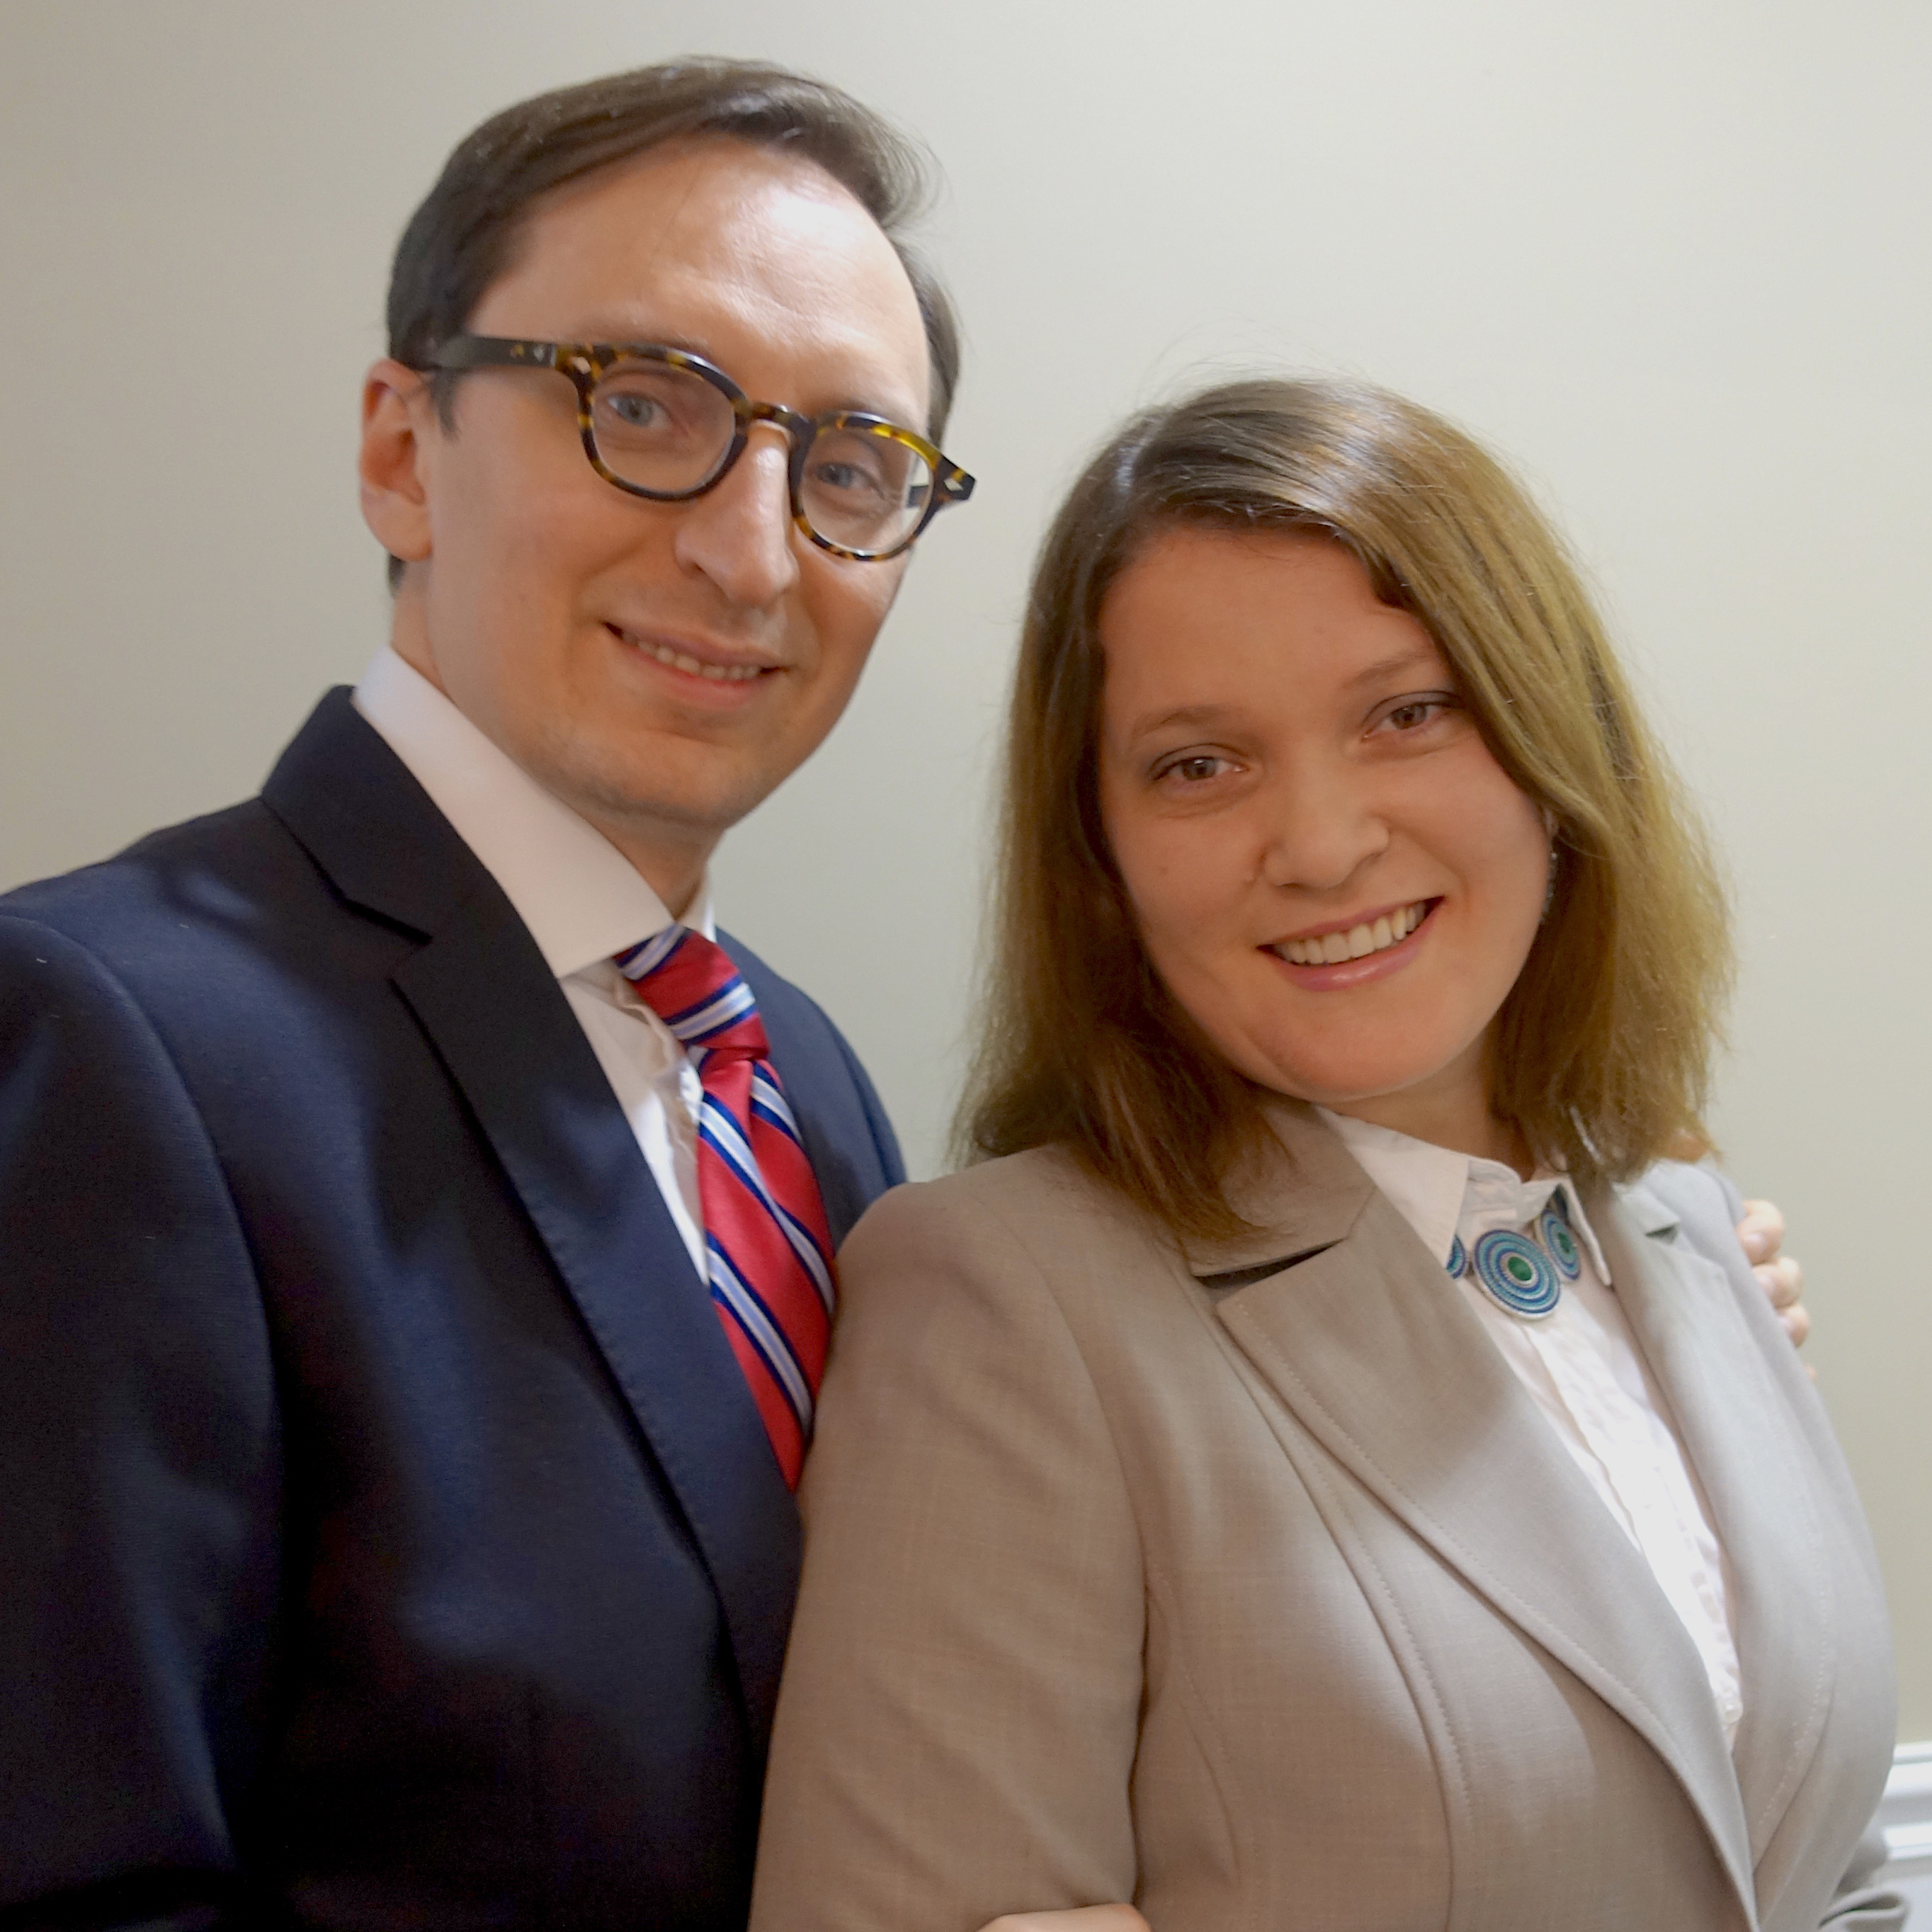 Nikolay and Yuliya Ustyuzhaninov